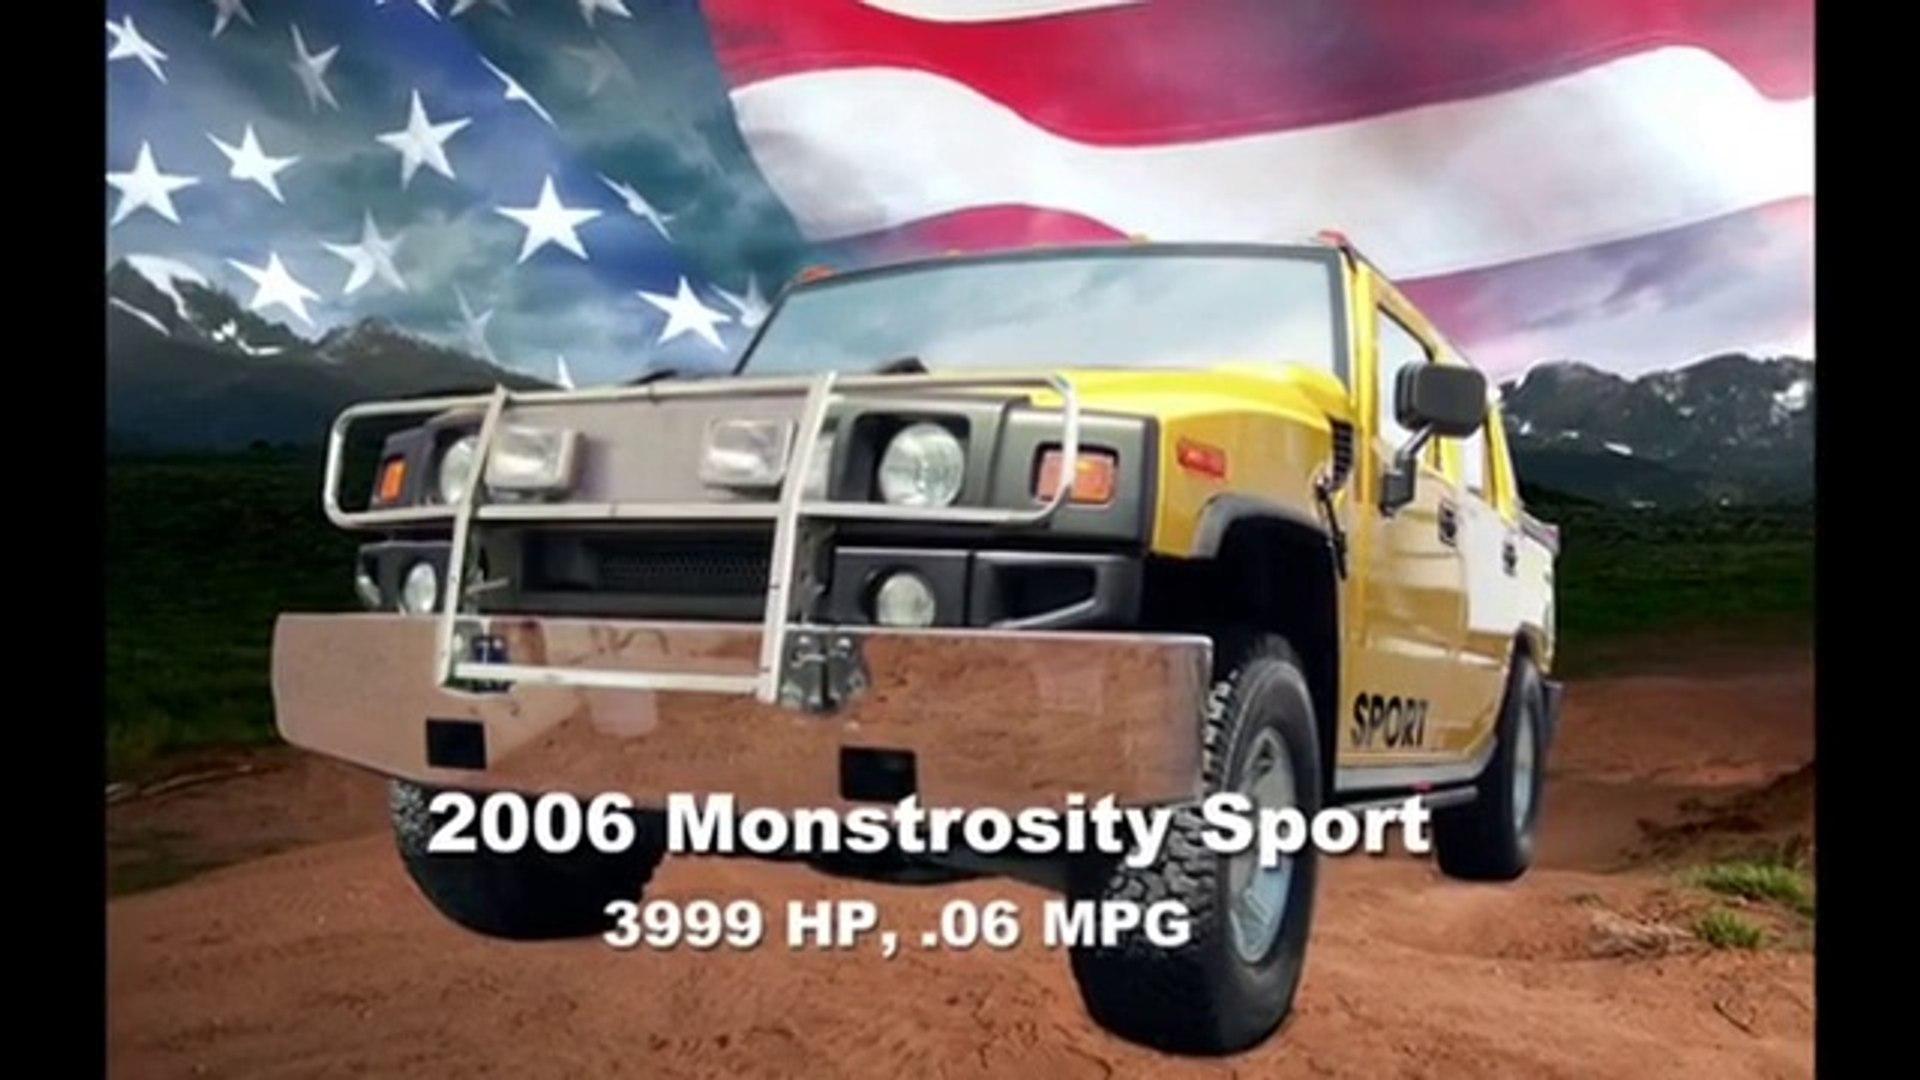 Lustig - Marschel mit 2006 Monstrosity oder 2006 Monstrosity Sport